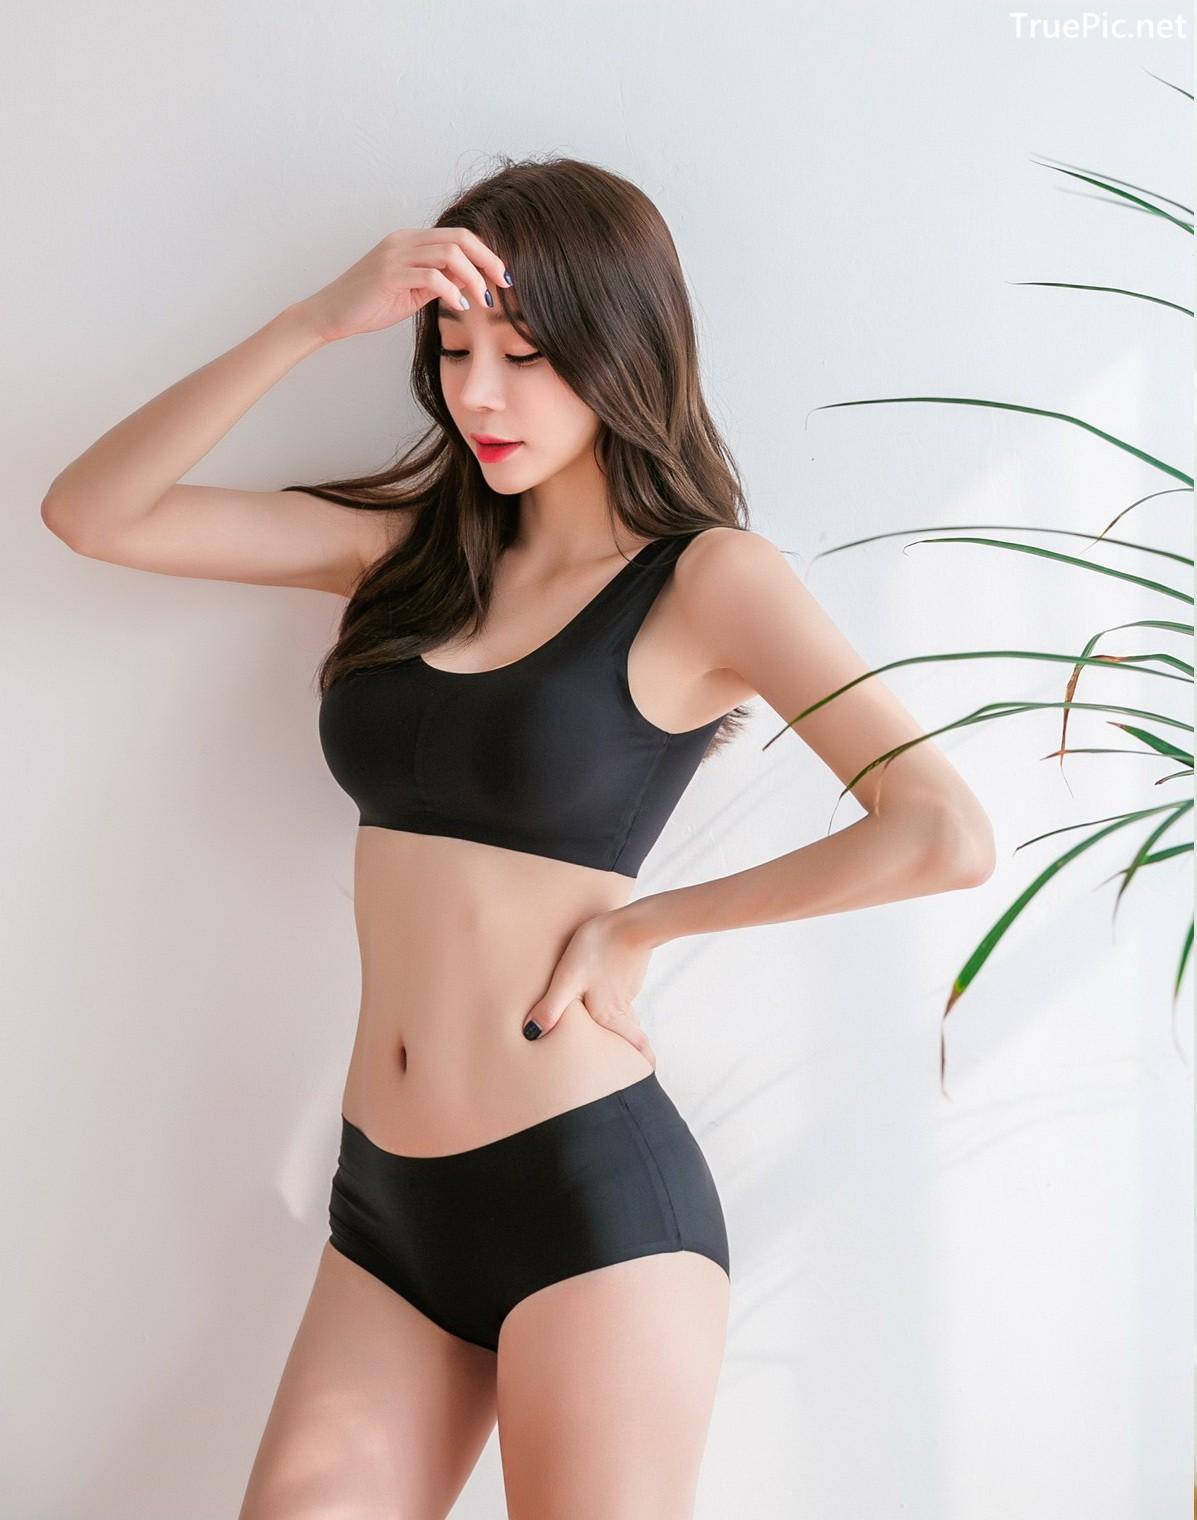 Image Korean Fashion Model - Hyun Kyung - Black Tube Lingerie - TruePic.net - Picture-2